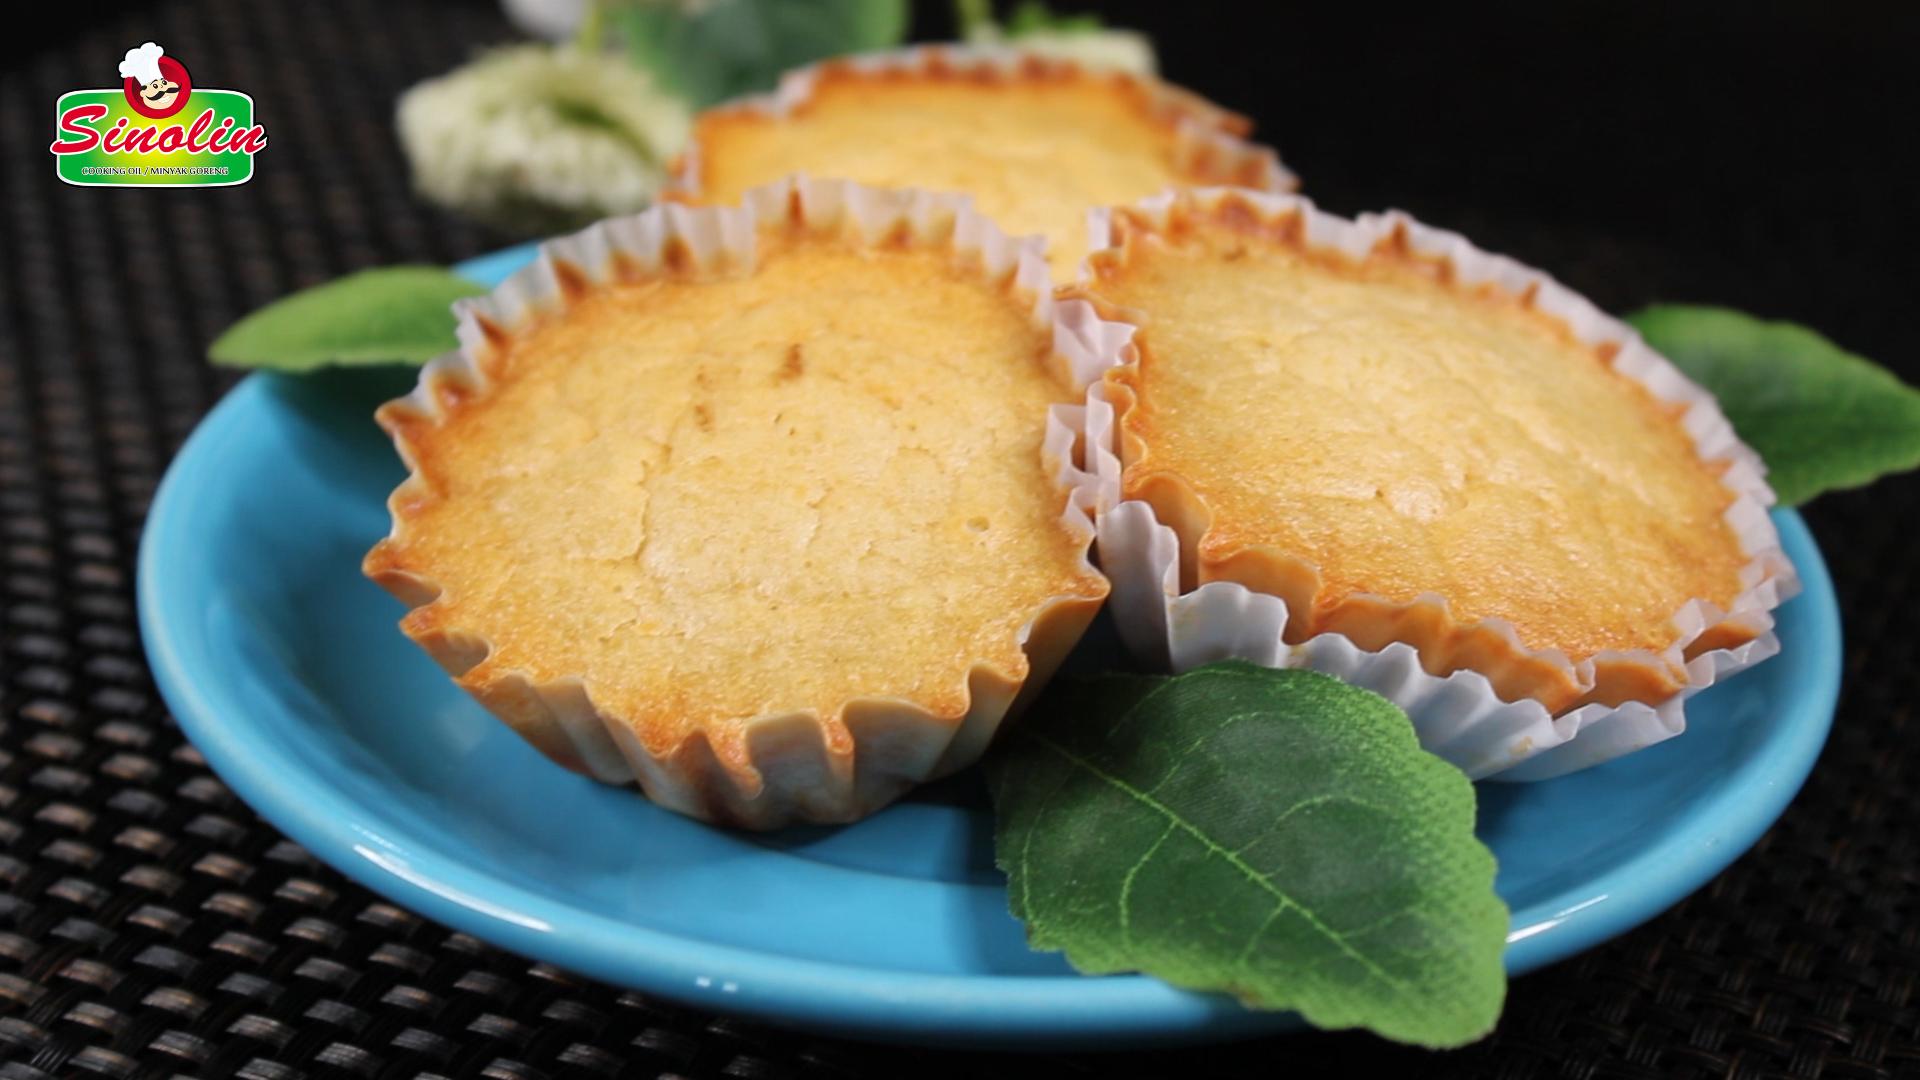 Muffin nanas Oleh Dapur Sinolin